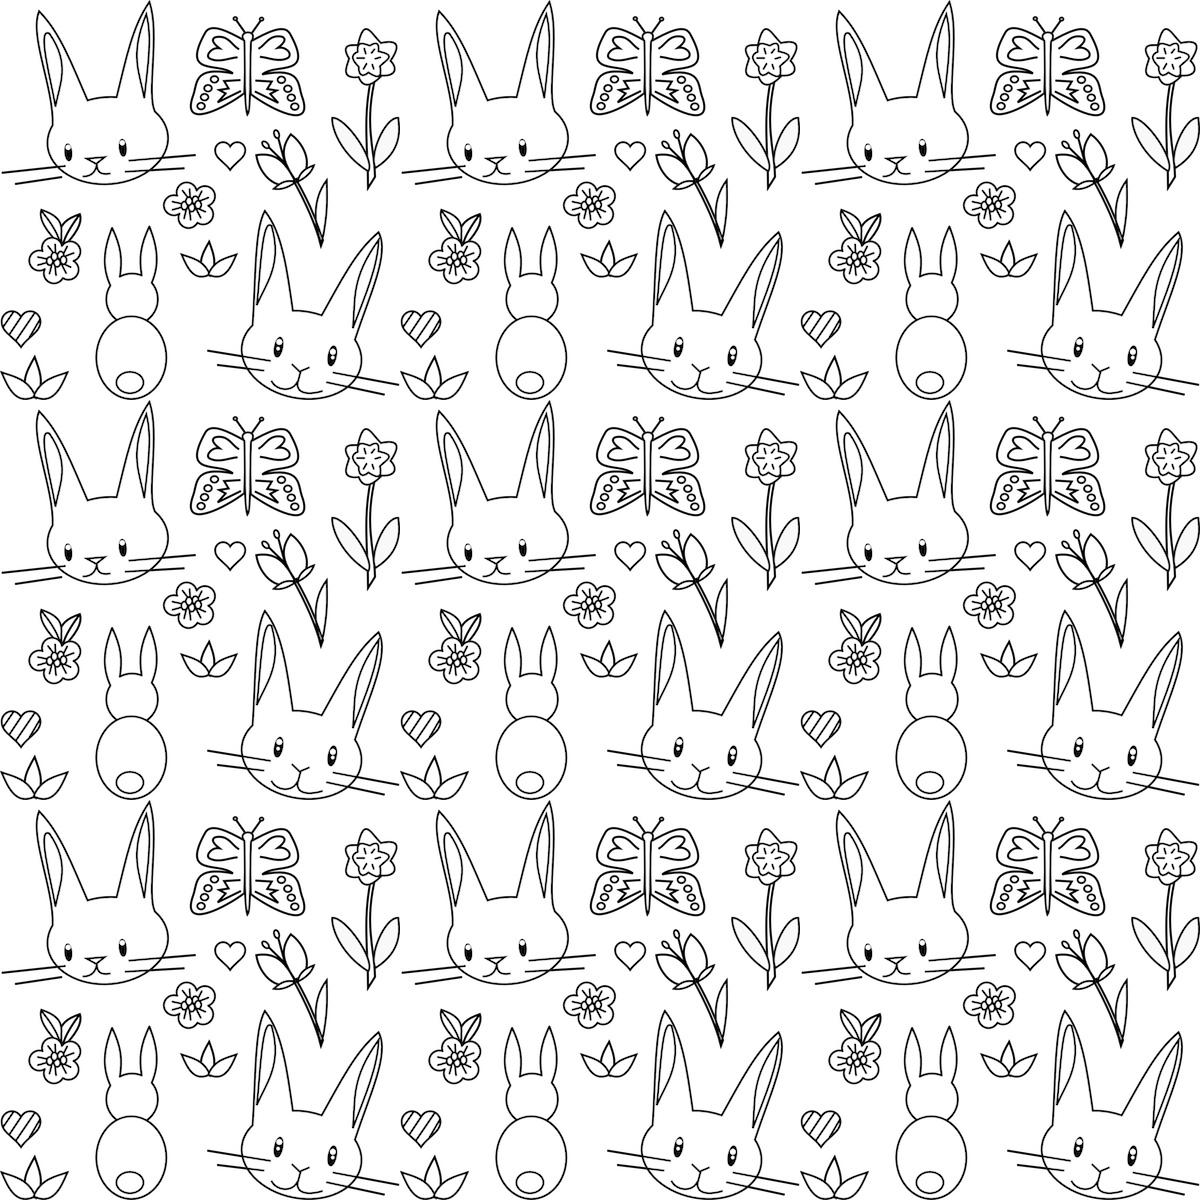 free printable bunny coloring page ausdruckbares ausmalpapier